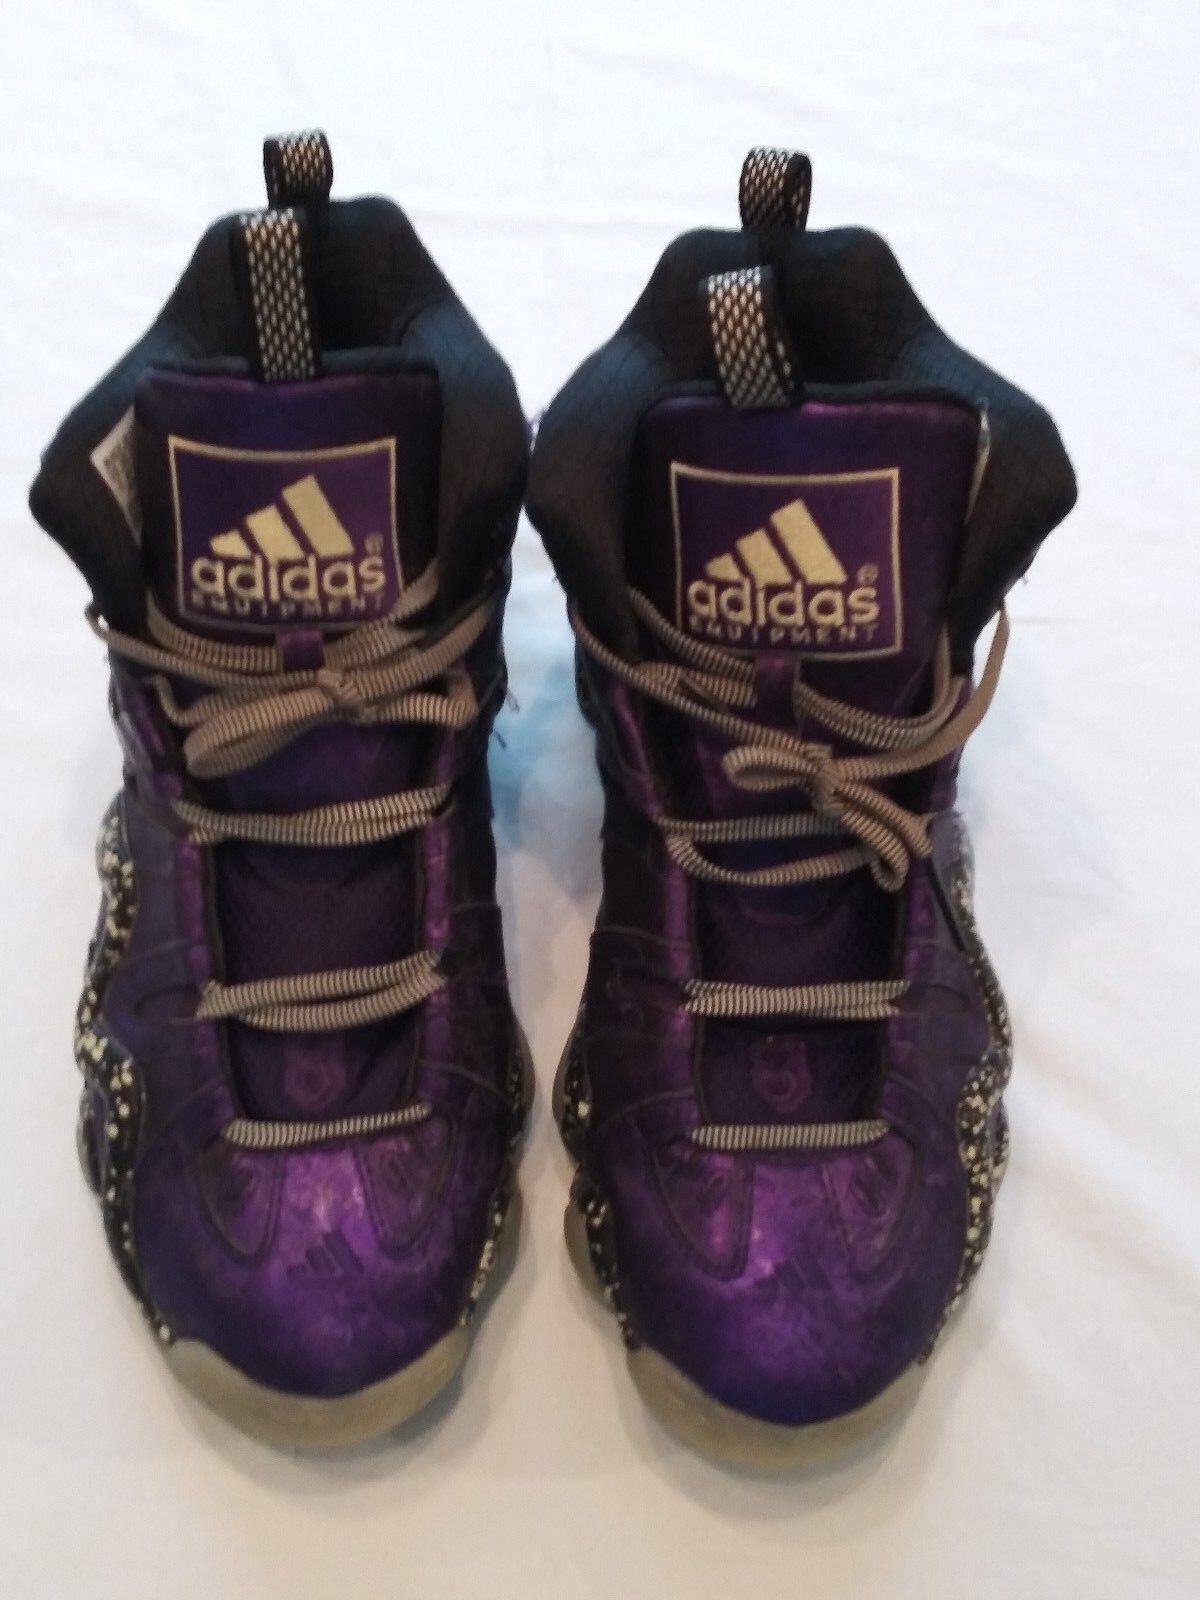 Uomini pazzi adidas 8 scarpe da ginnastica adidas pazzi incubo prima di natale viola 2fdb42